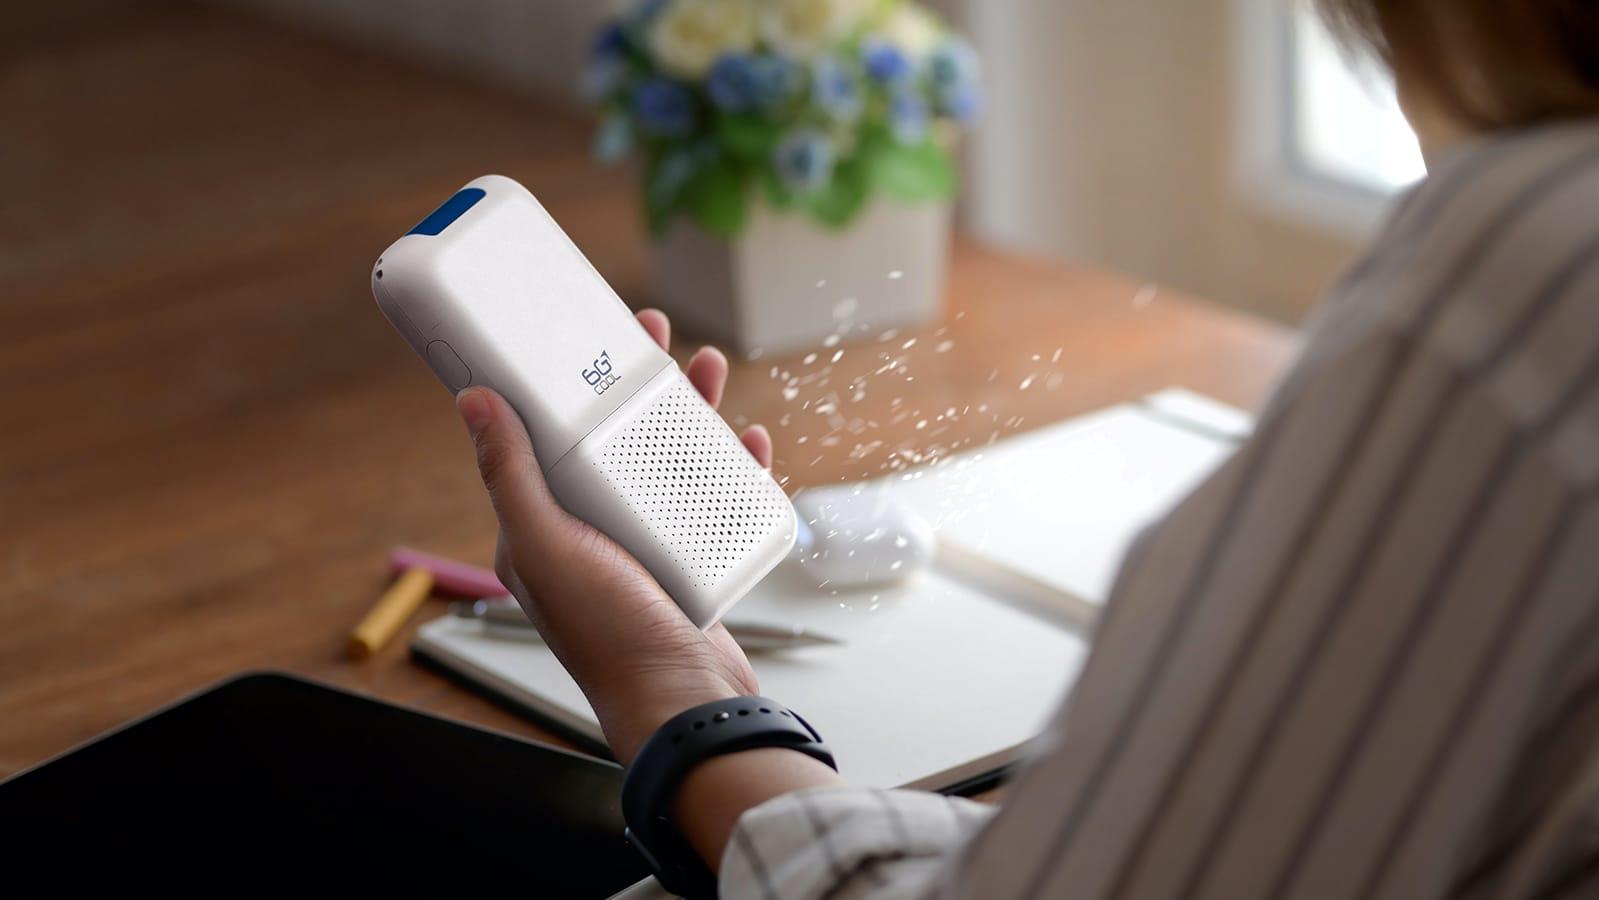 6GCool Tiny High-Tech Air Purifier